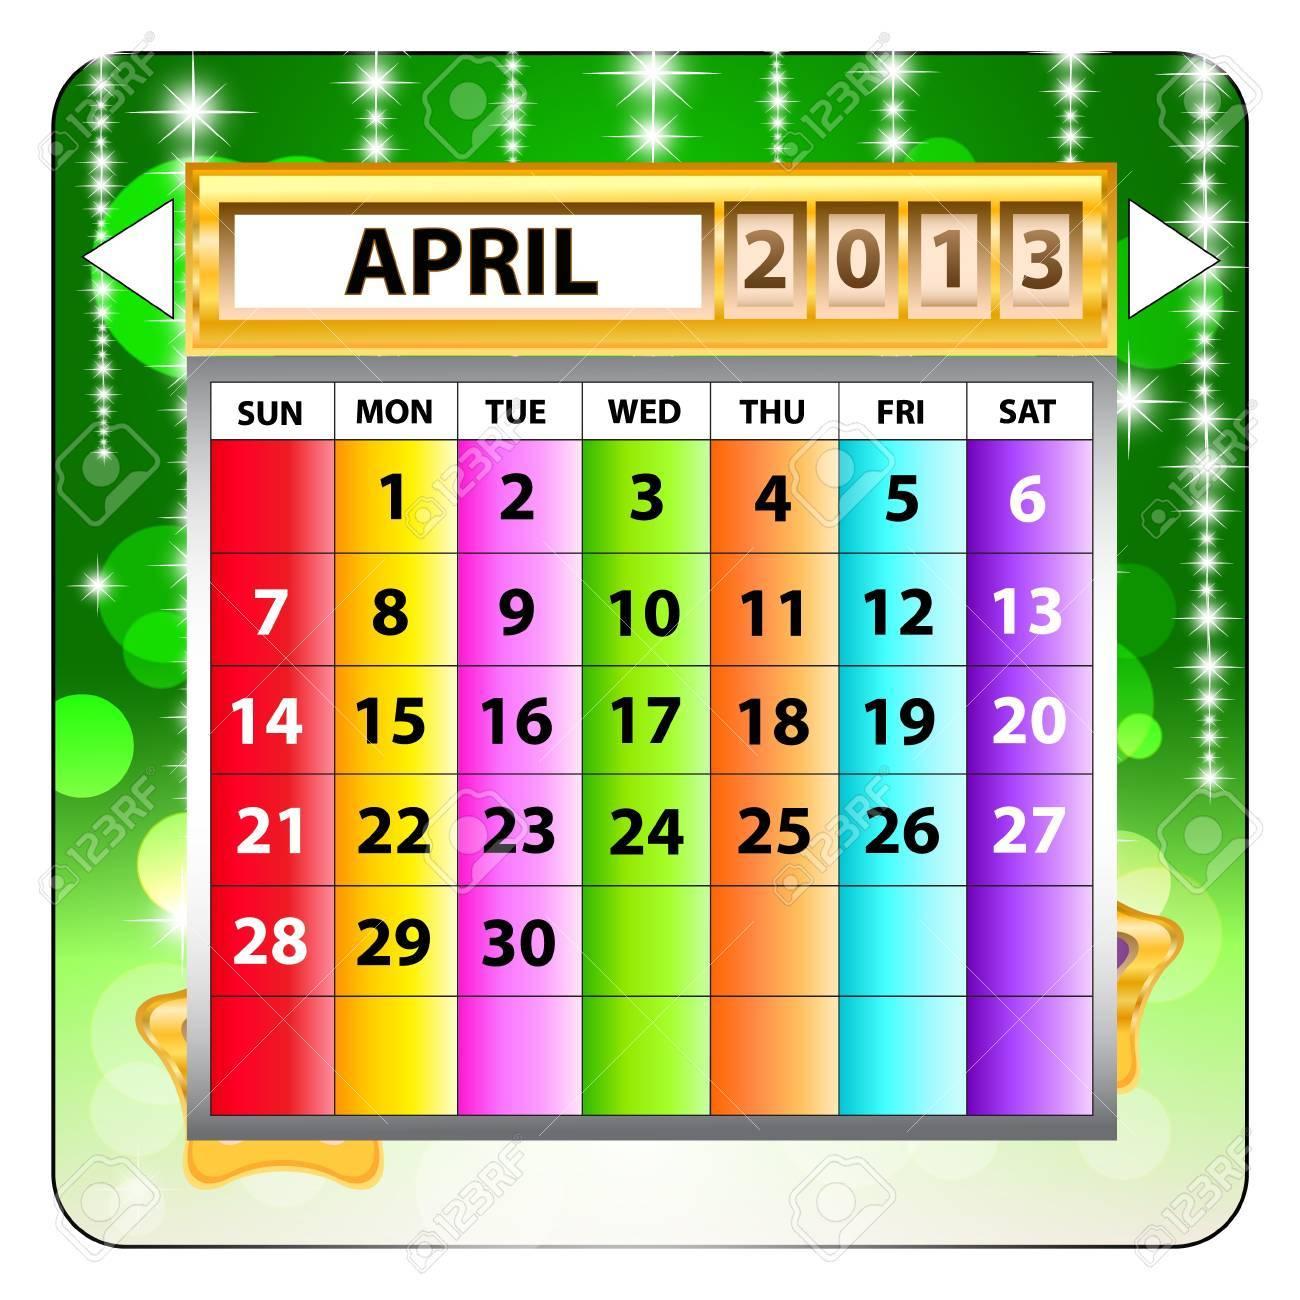 April 2013 calendar  Happy new year Stock Vector - 15143287